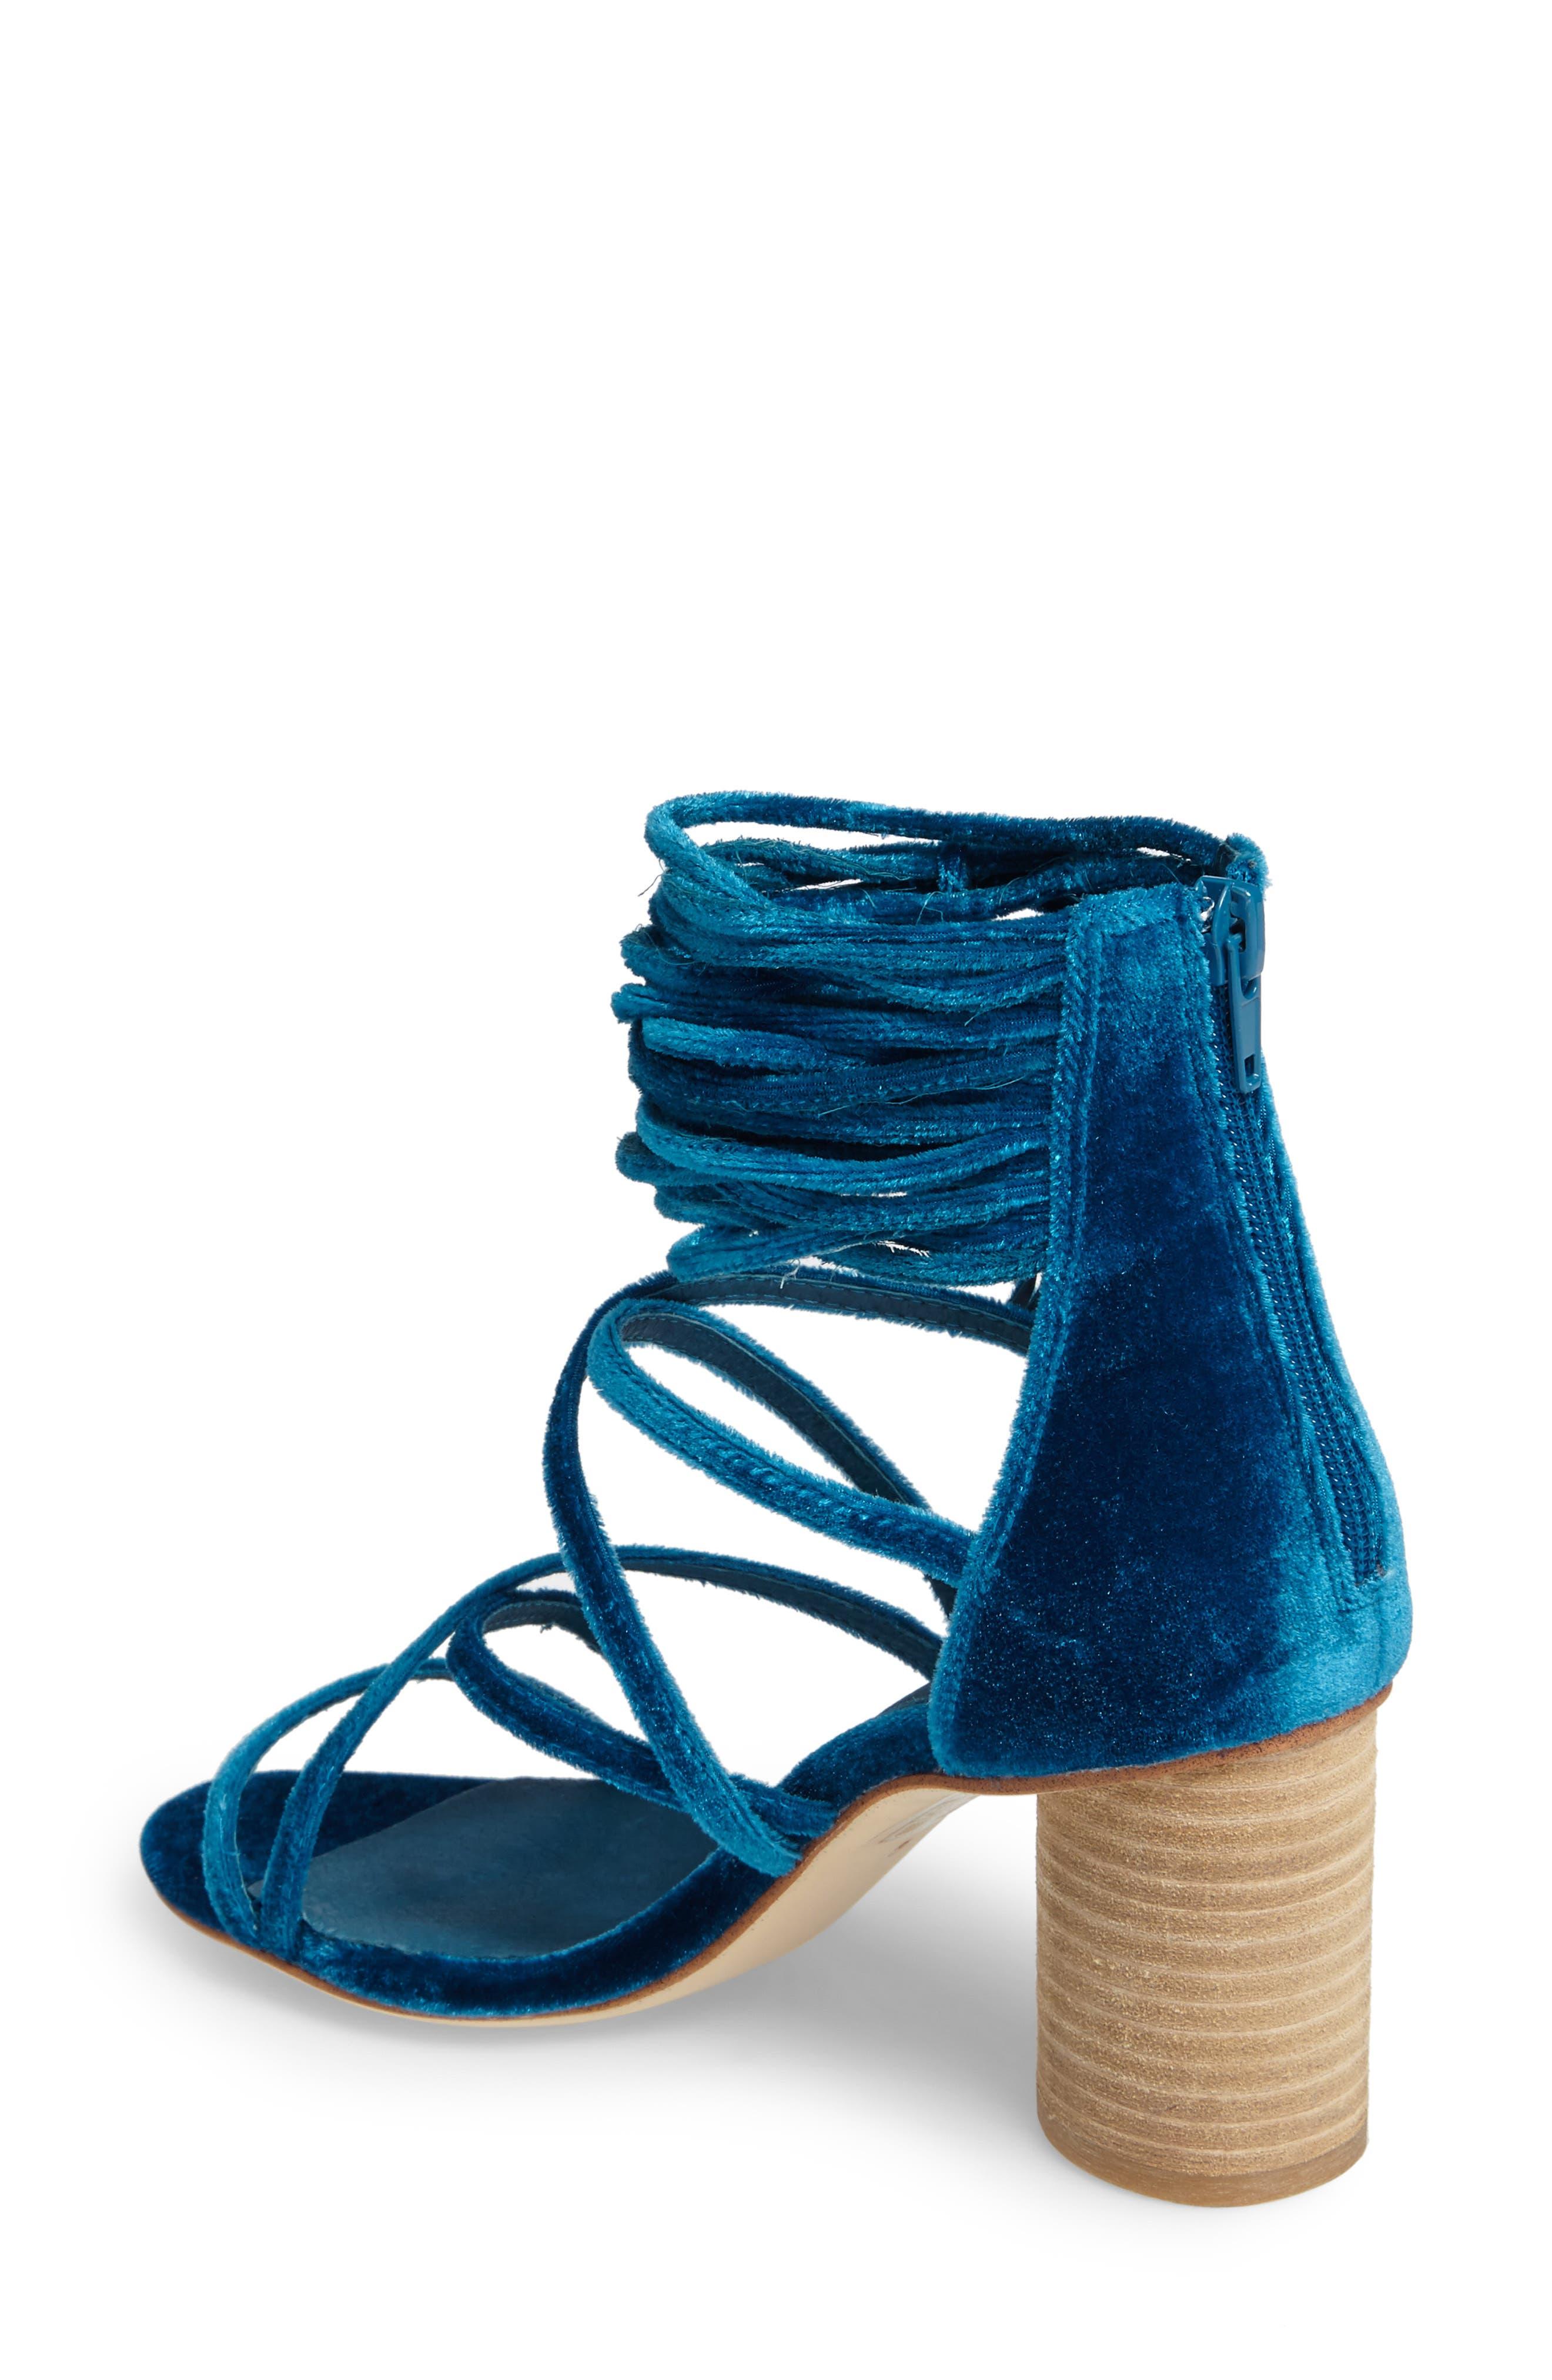 'Despina' Strappy Sandal,                             Alternate thumbnail 12, color,